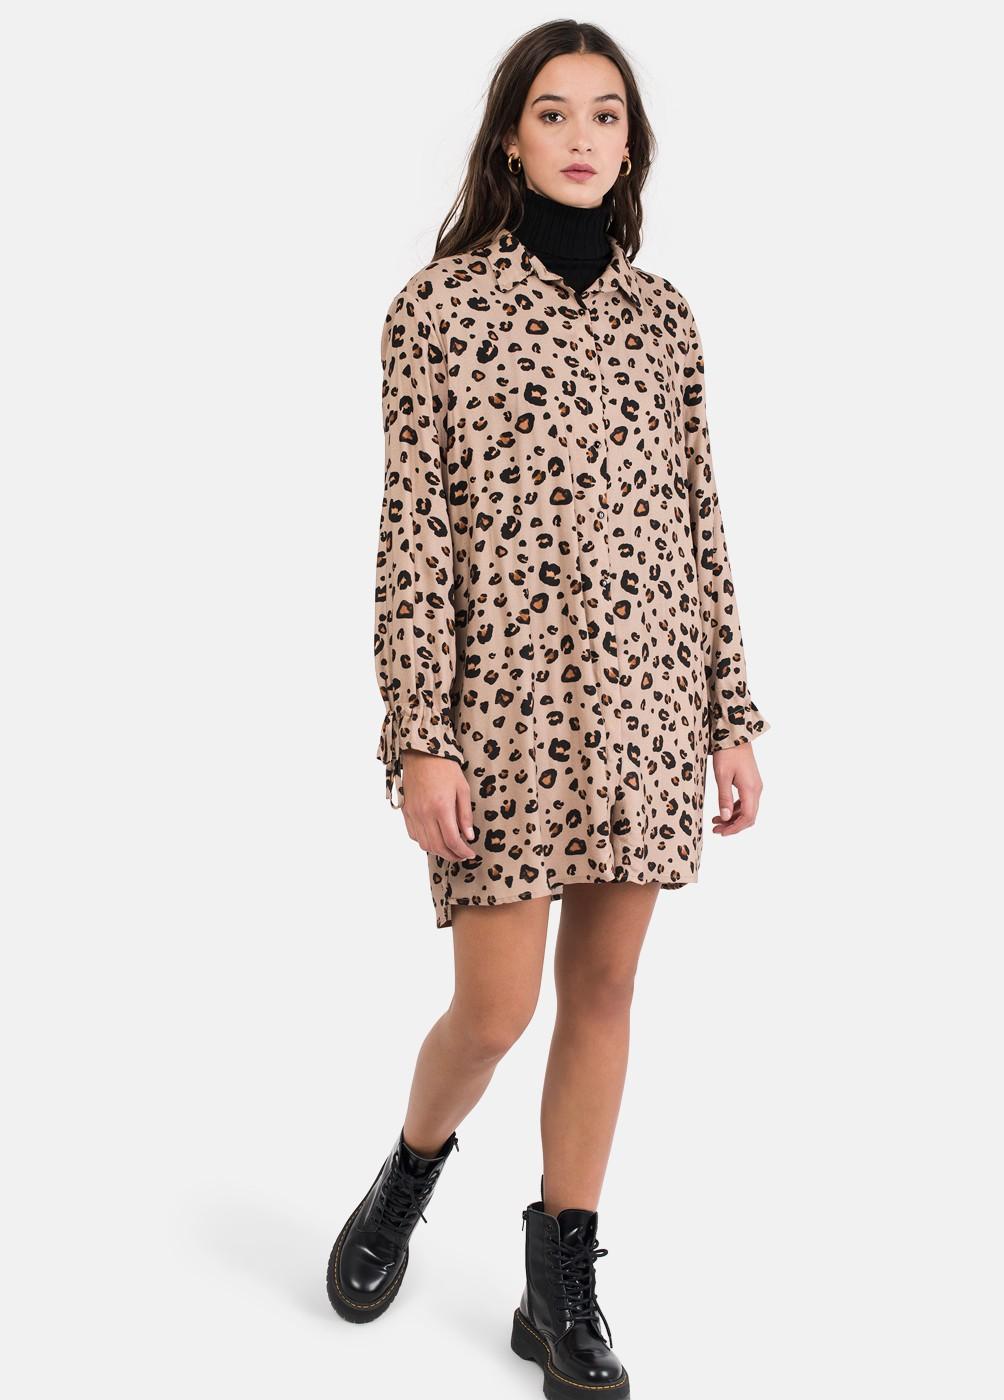 85a0d4b2c7 Vestido Libra Camisero Animal Print